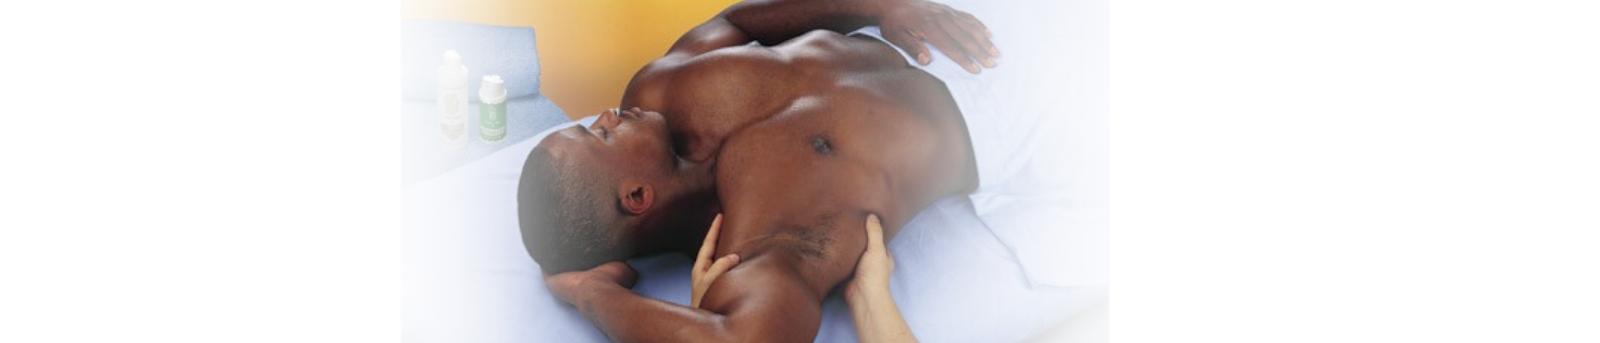 man receiving massage to torso